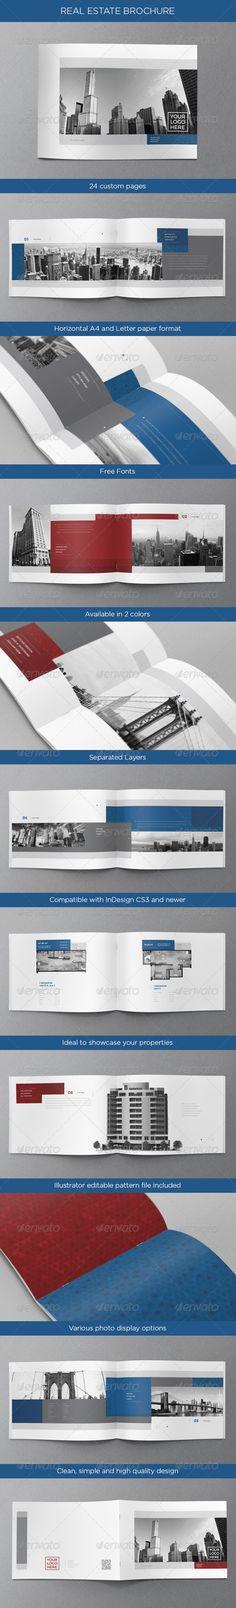 Real Estate Brochure - GraphicRiver Item for Sale